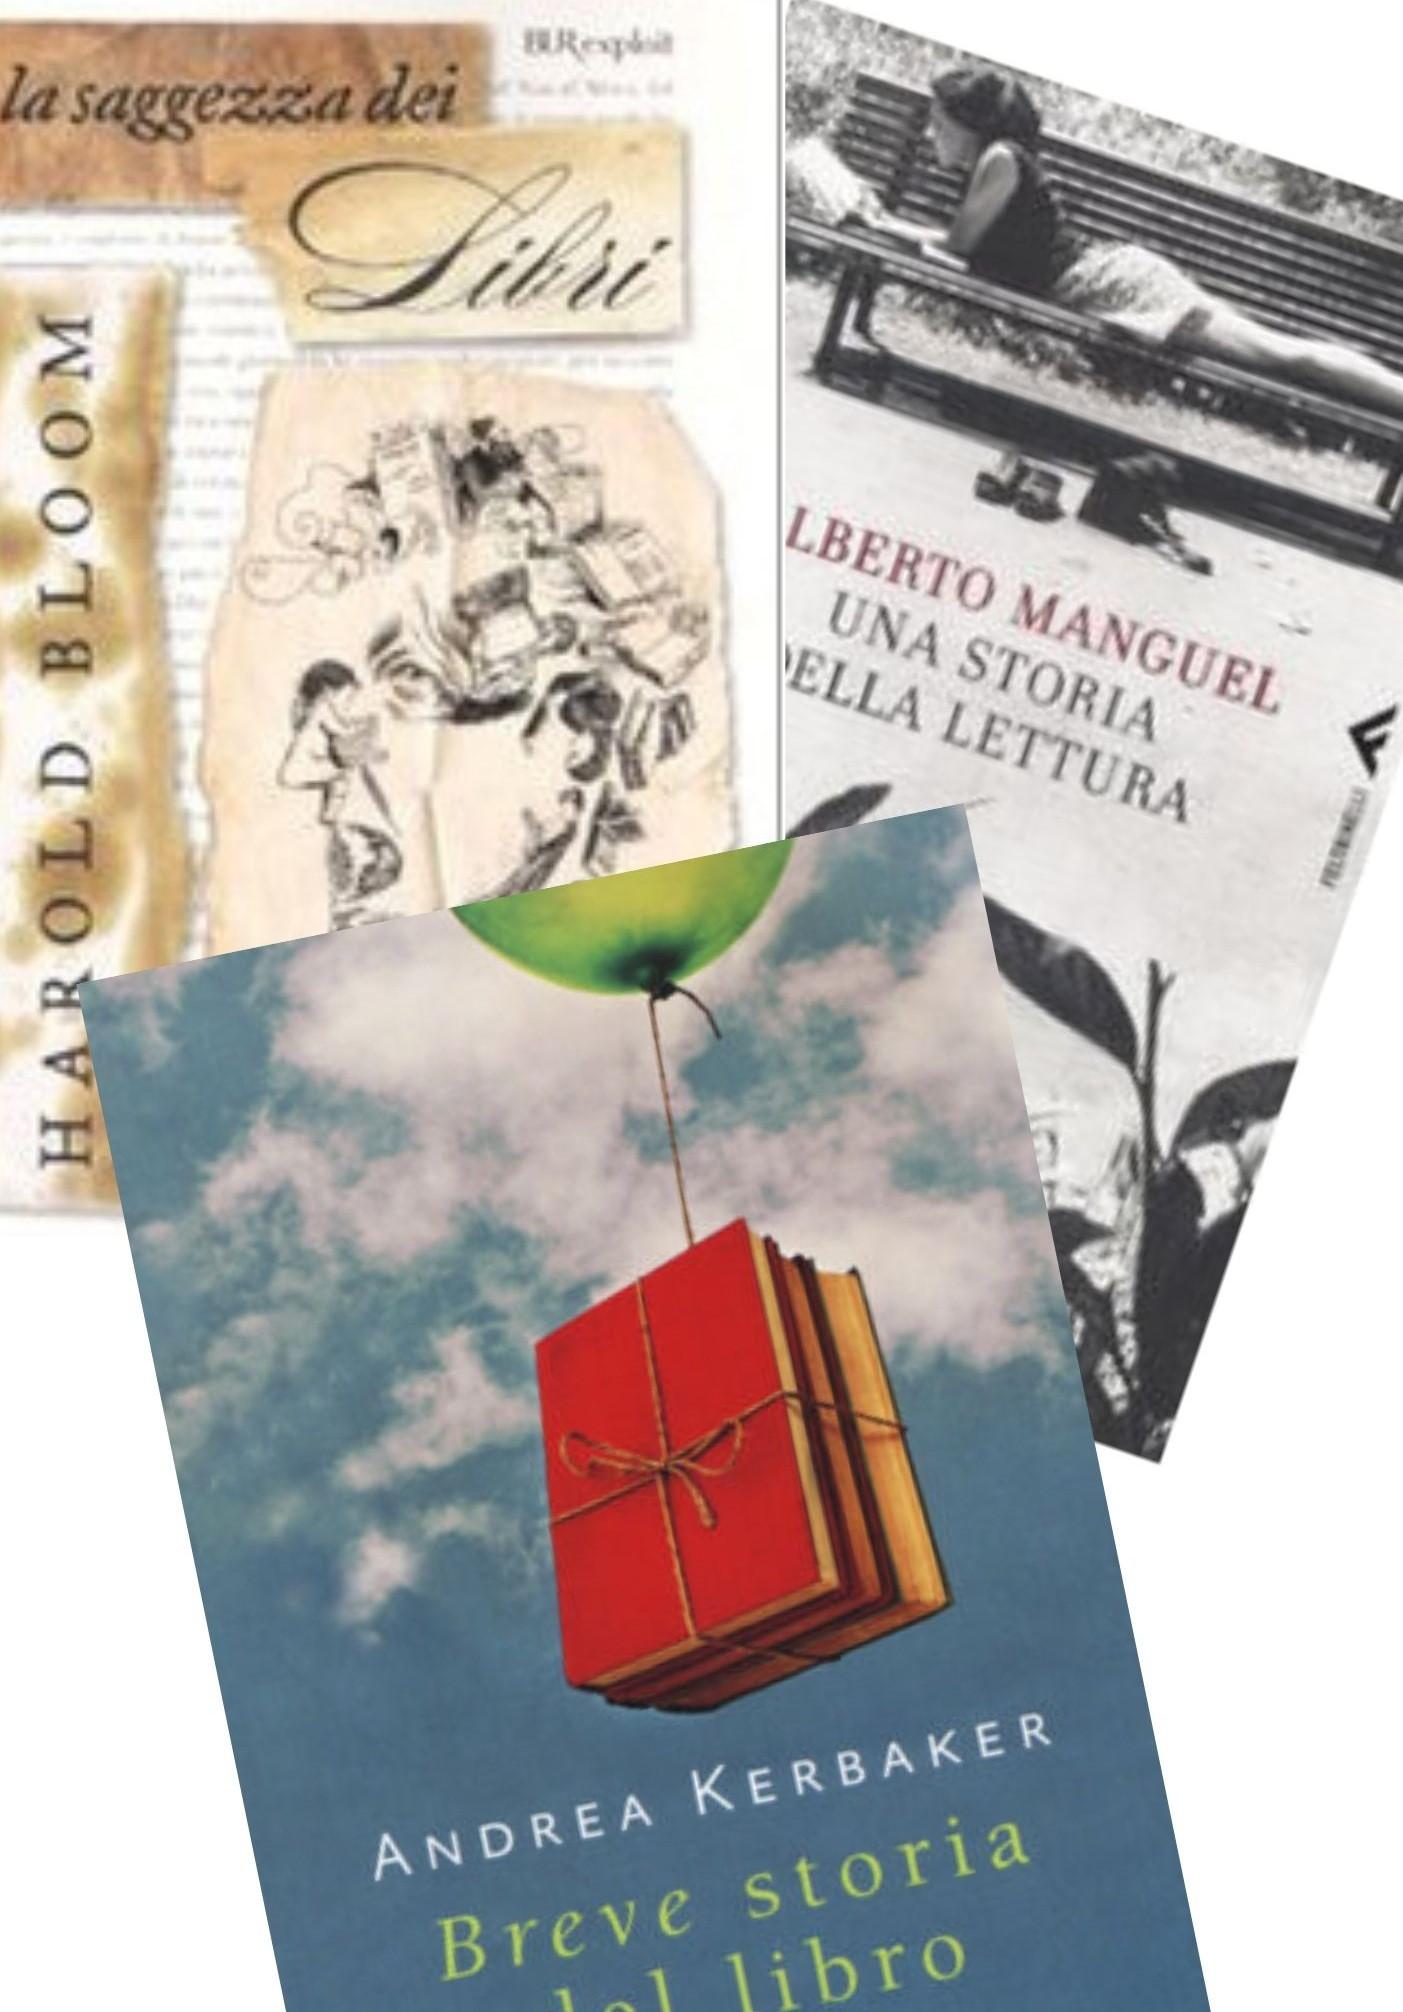 Tre perle di bibliofilia targate Kerbaker, Bloom e Manguel in bancarella